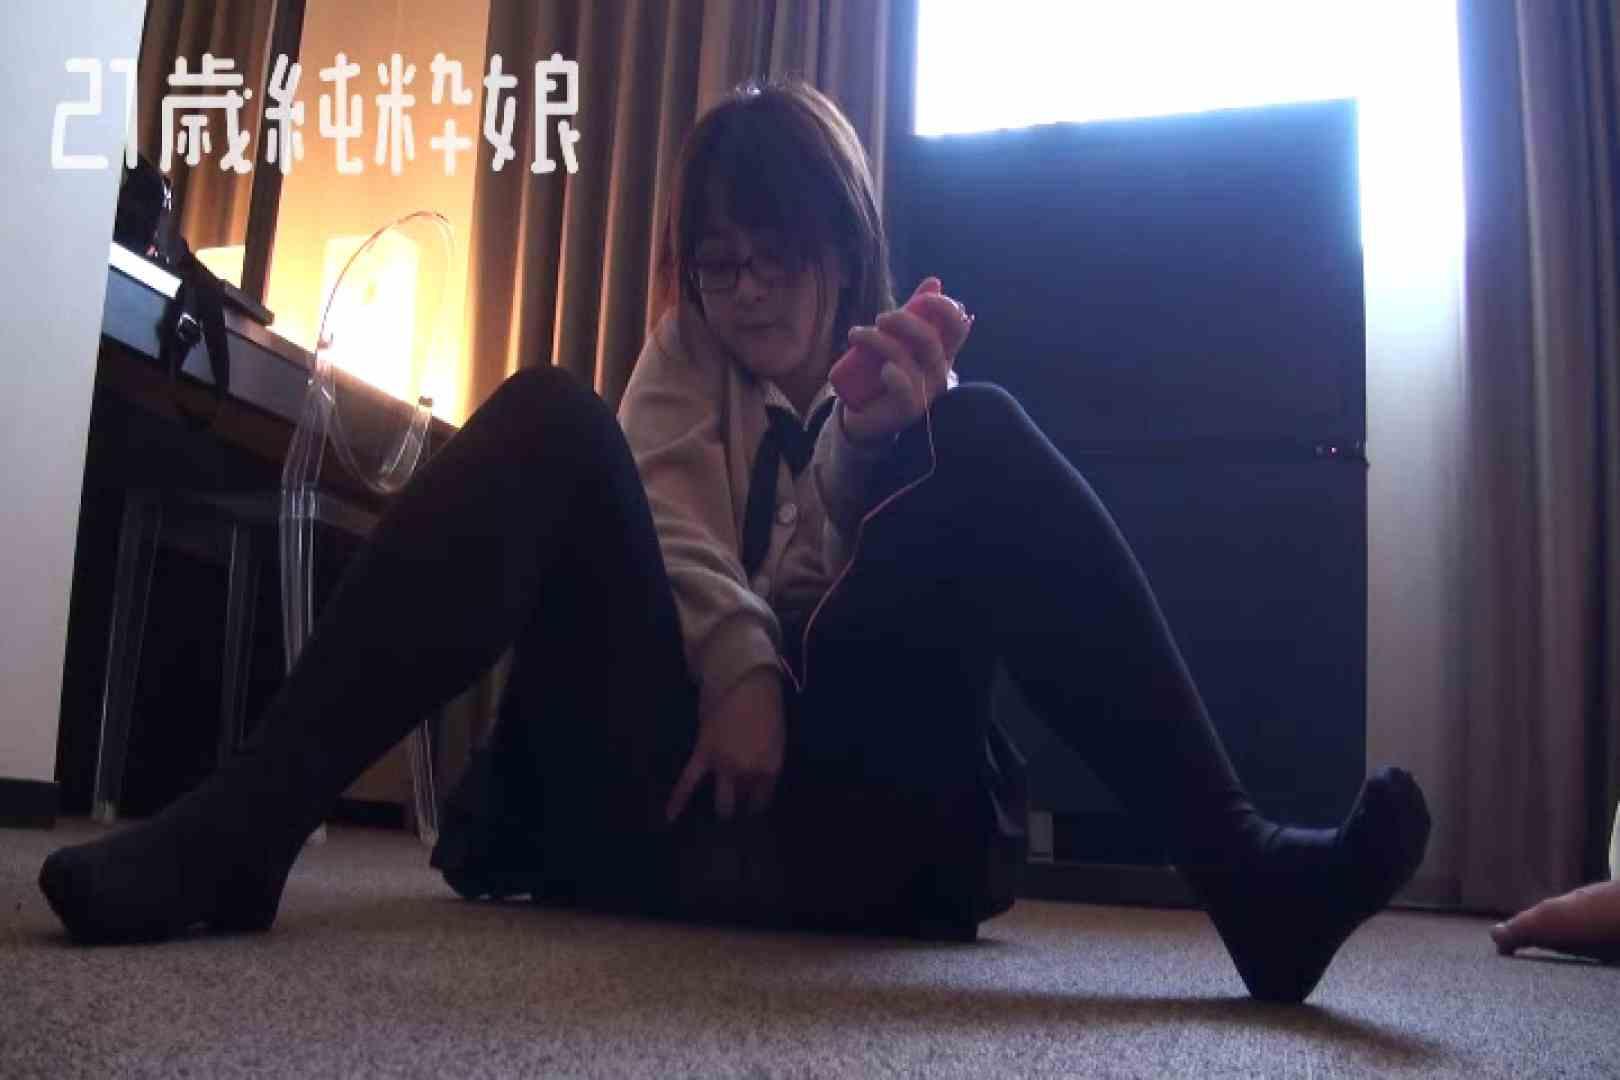 Gカップ21歳純粋嬢第2弾Vol.3 性欲 盗撮動画紹介 71pic 5